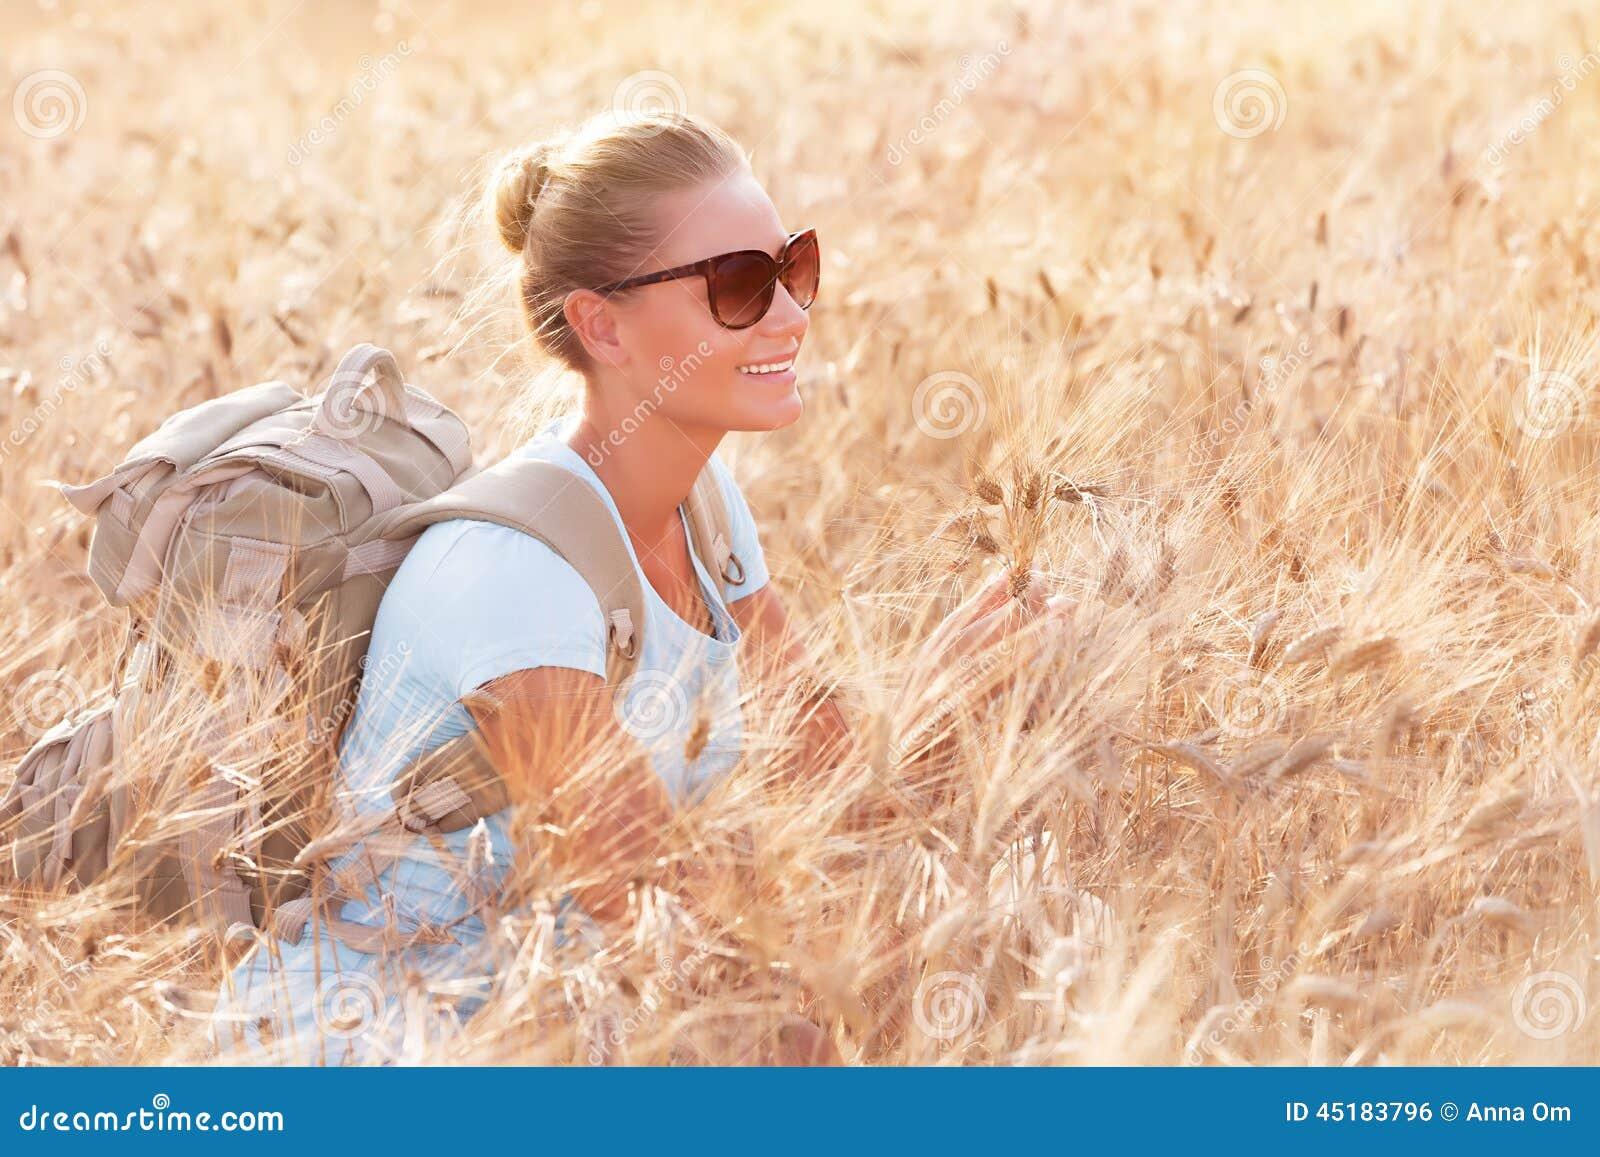 Enjoying autumn nature stock photo image 45183796 for Cheerful nature